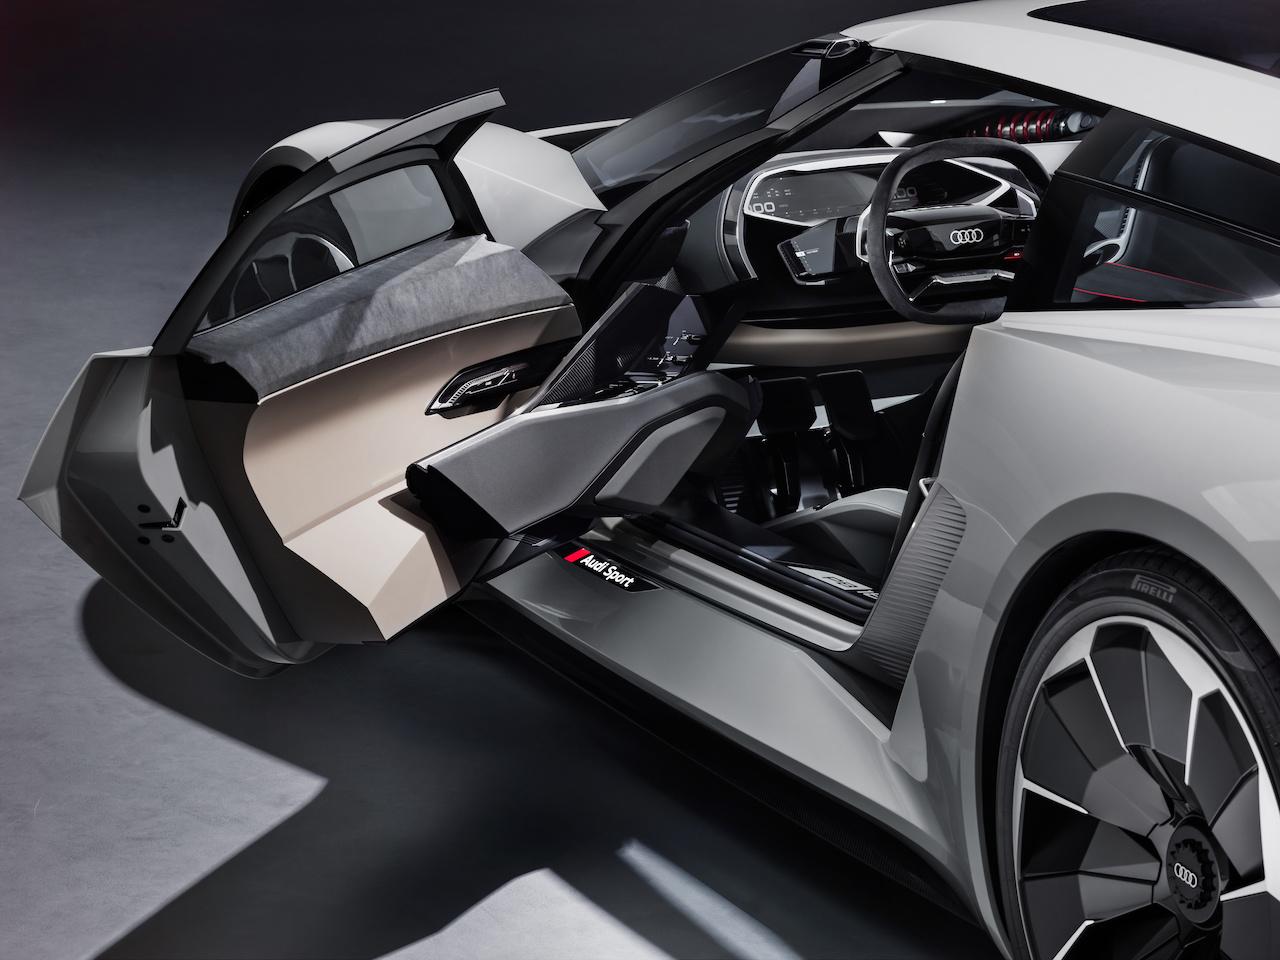 Dit is de 775 pk sterke Audi PB18! | Hartvoorautos.nl